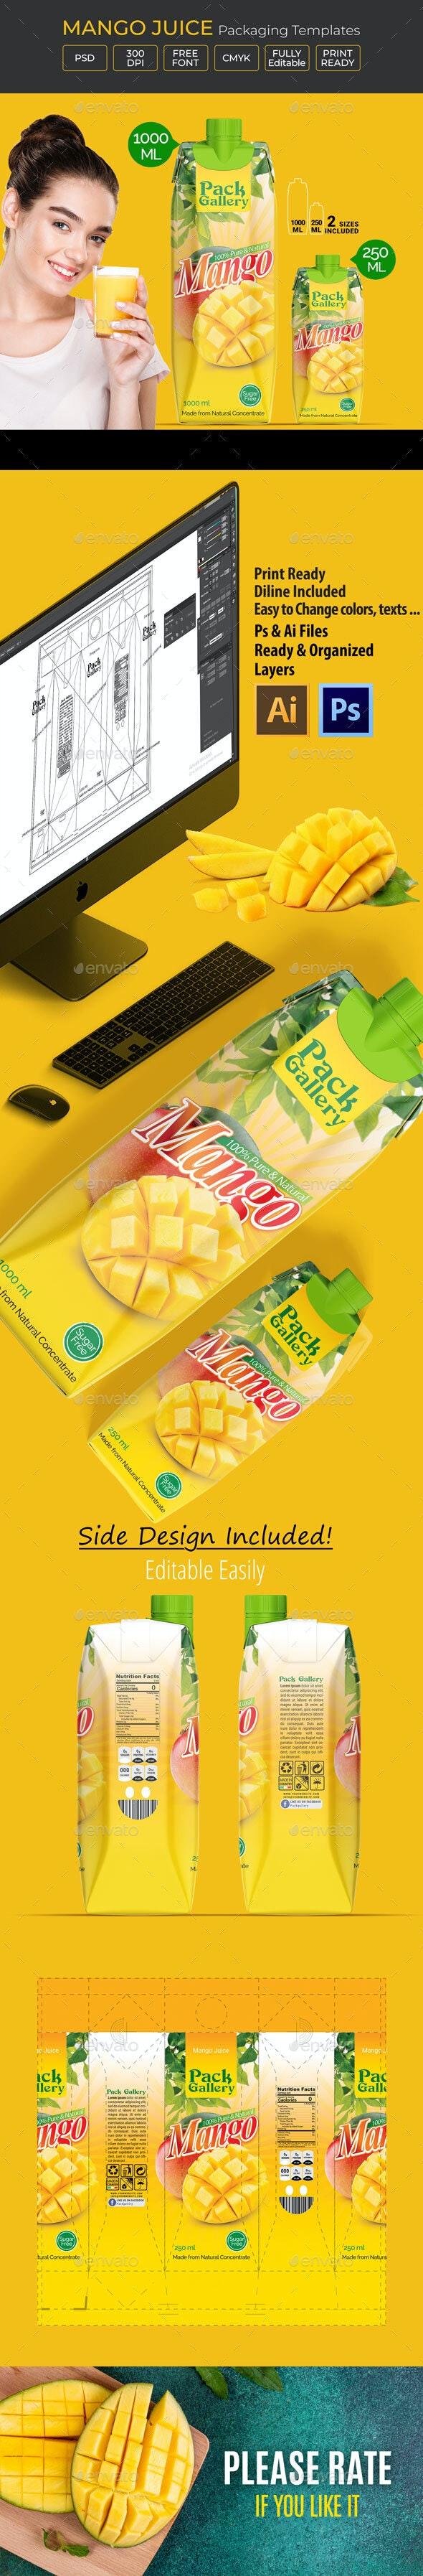 Mango Juice Template Packaging Design - Packaging Print Templates